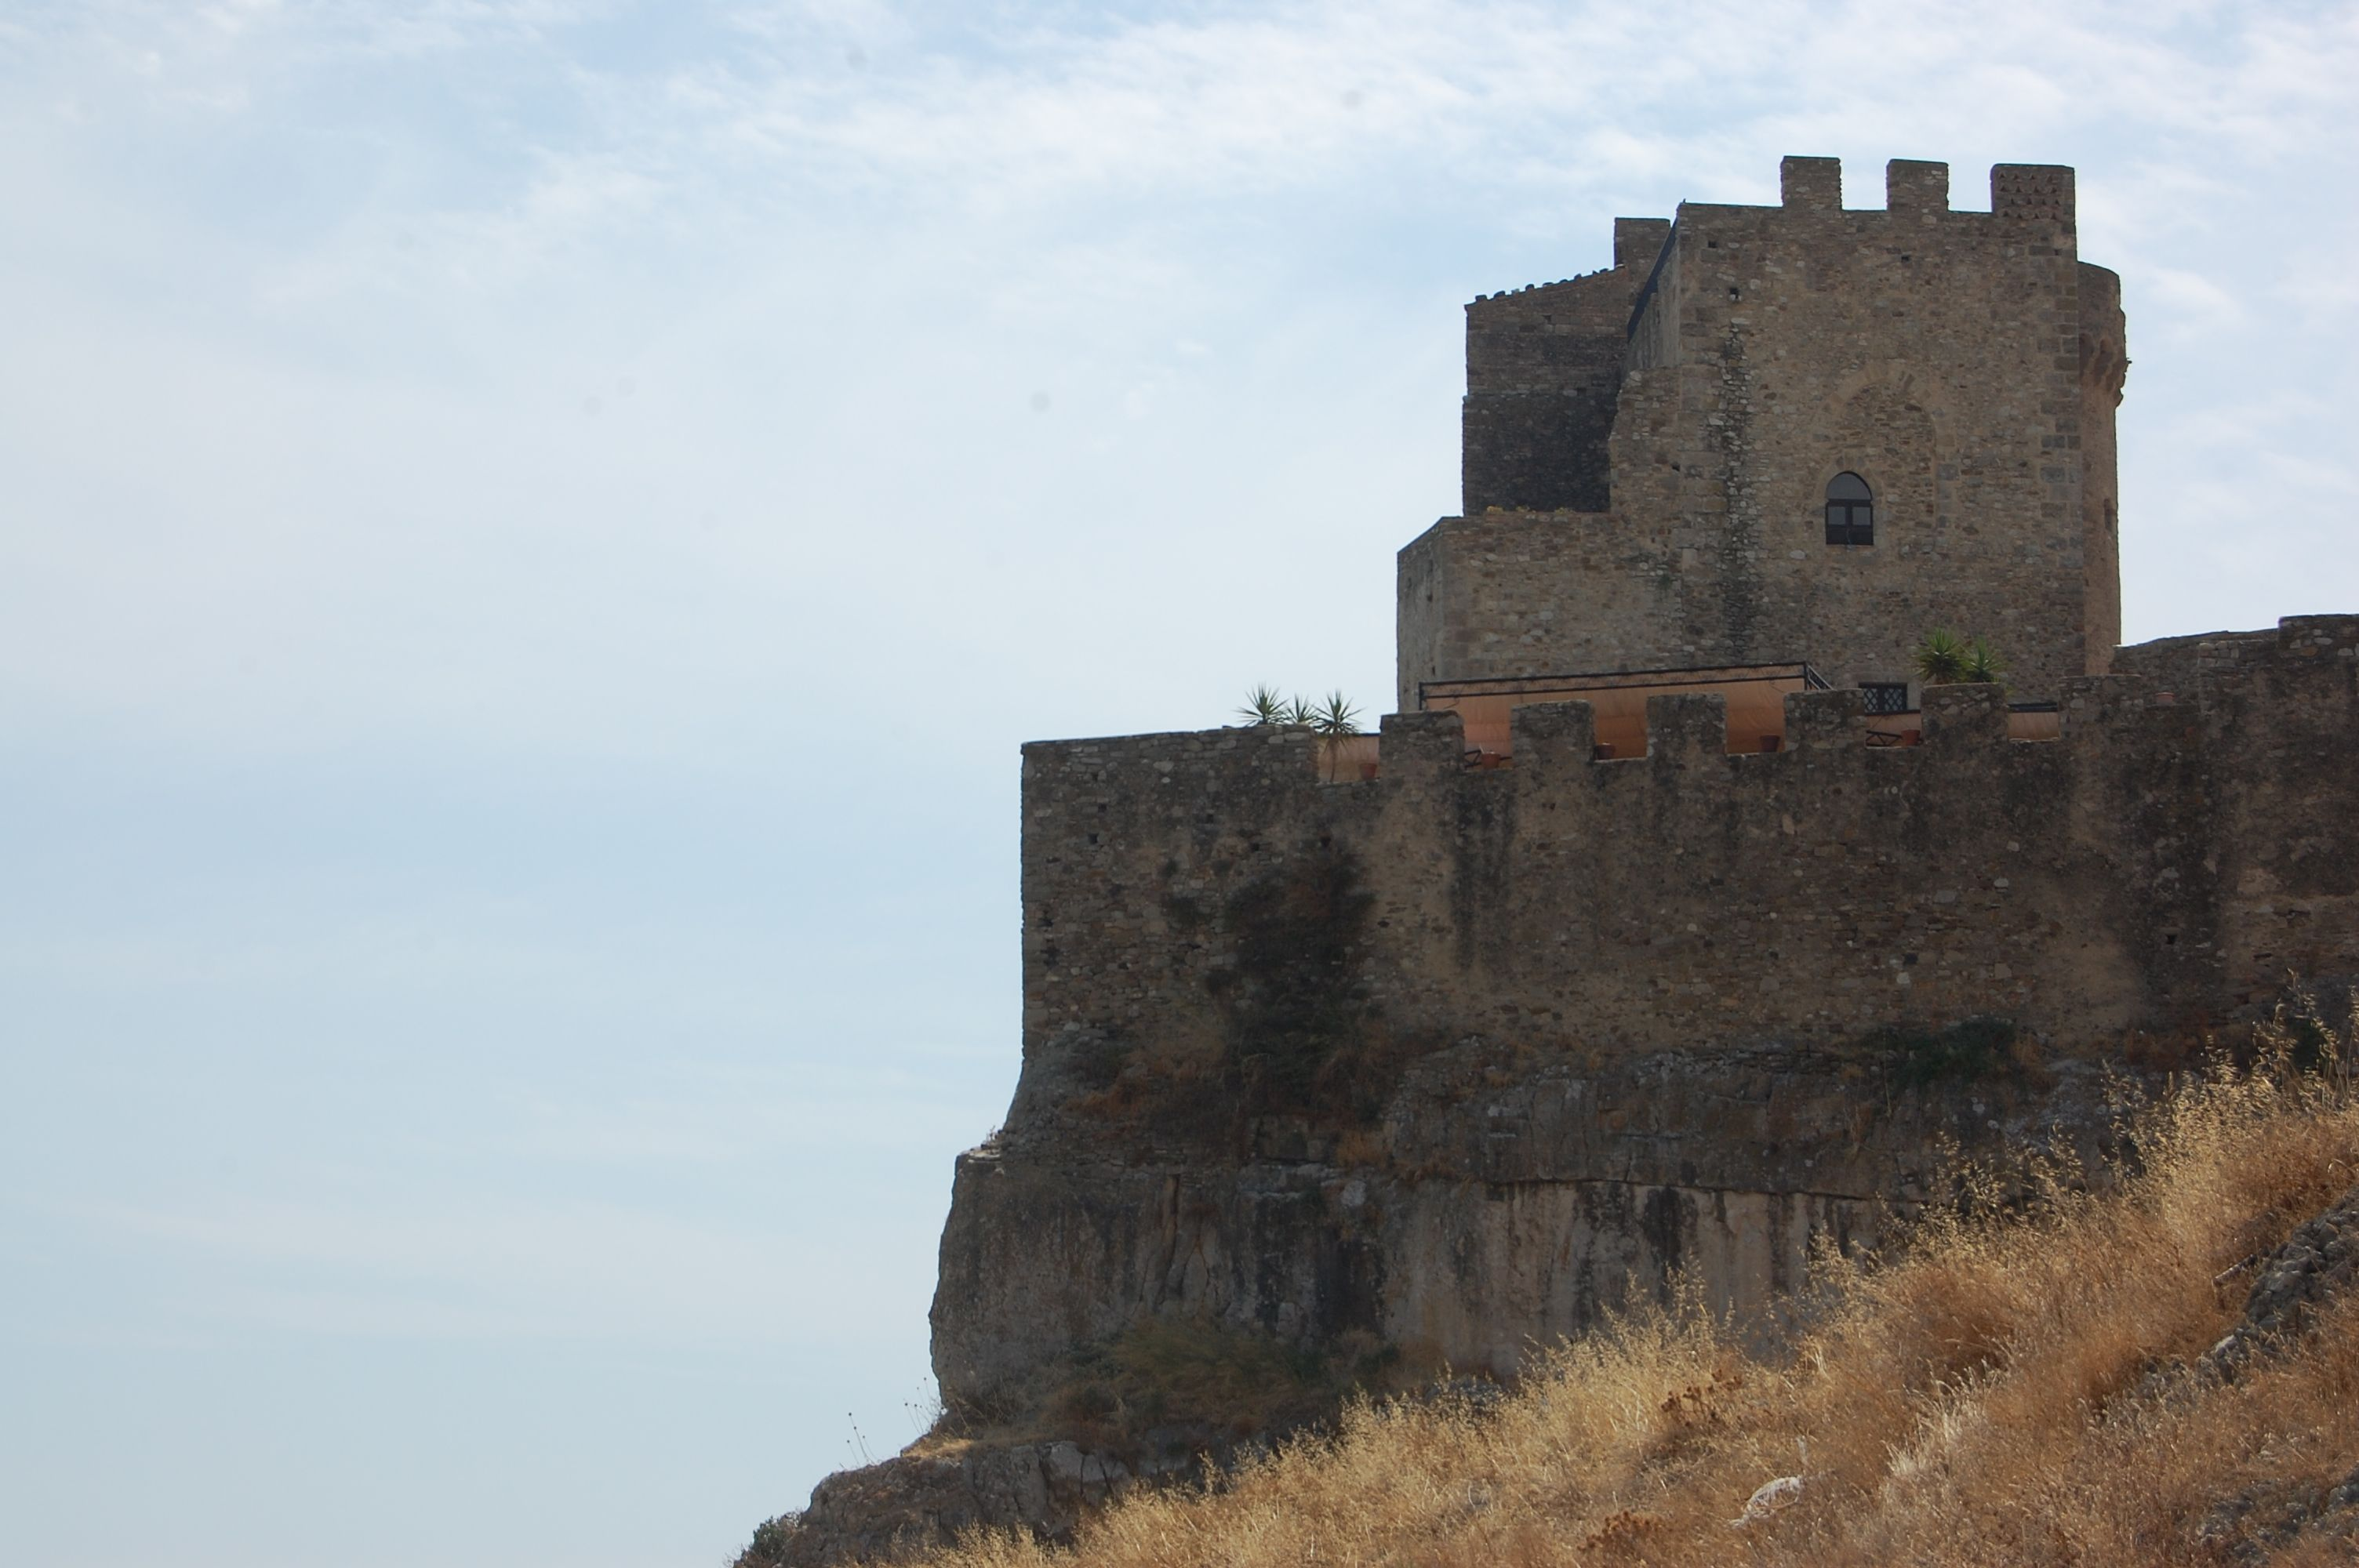 castle - Roseto Capo Spulico - Calabria